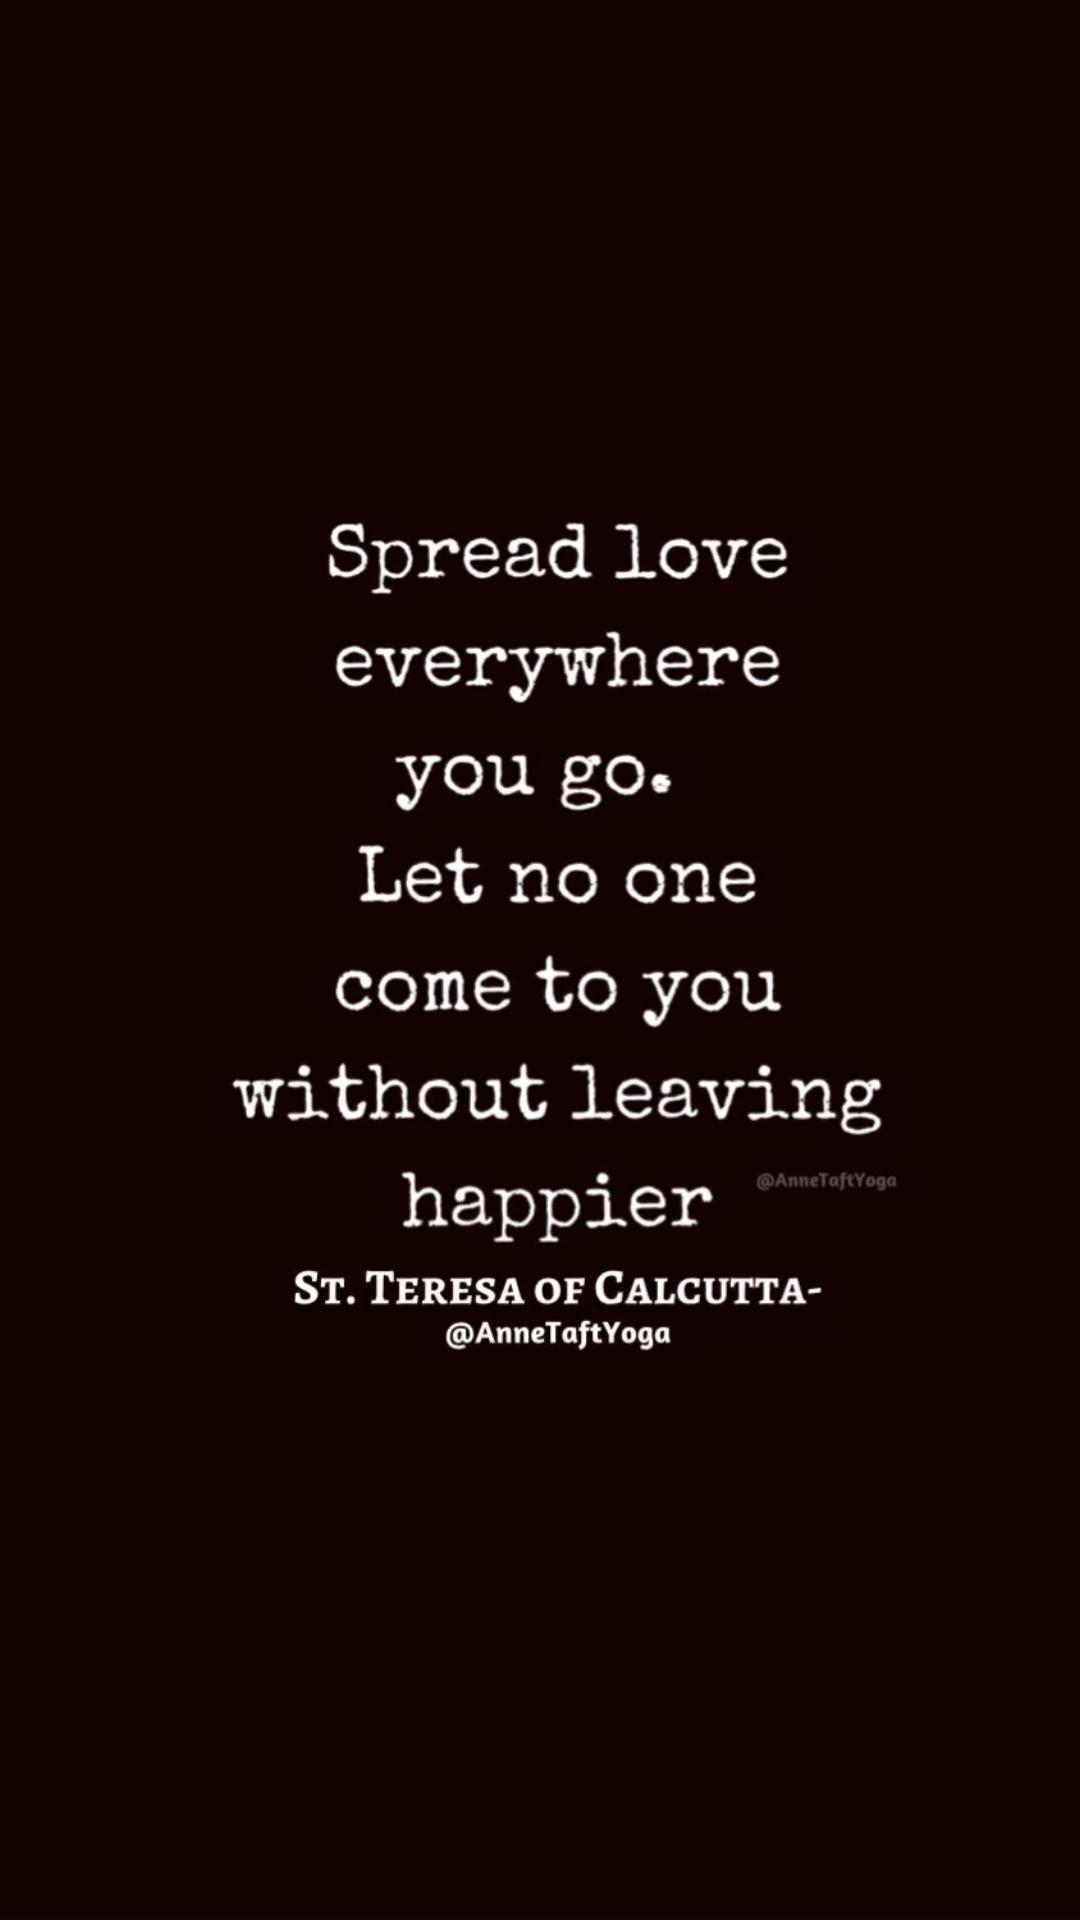 Spread Some Love